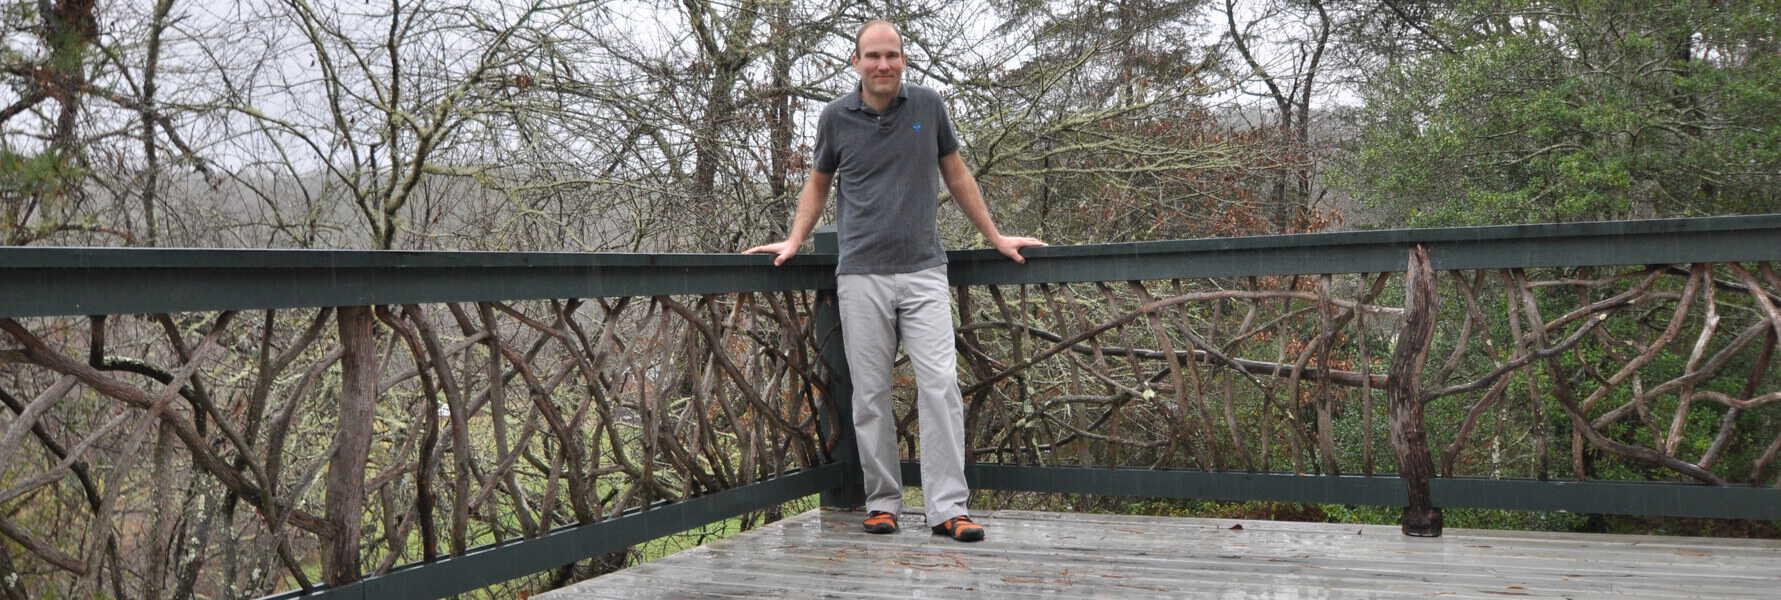 mountain-laurel-handrails-owner